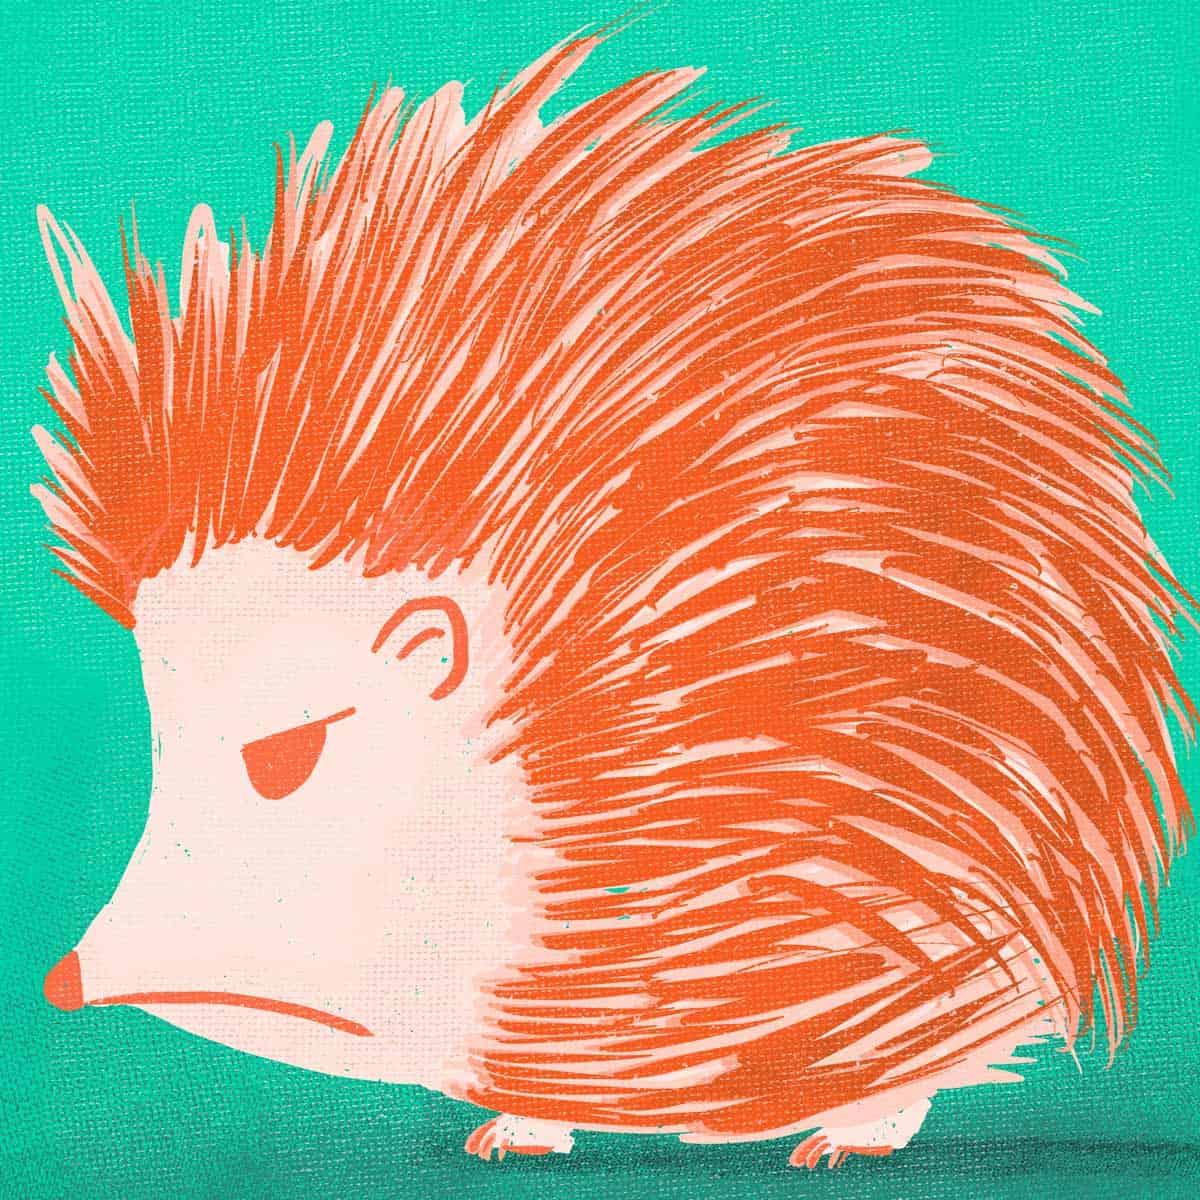 hilledesign-illustration-annoyed-animals-hedgehoge